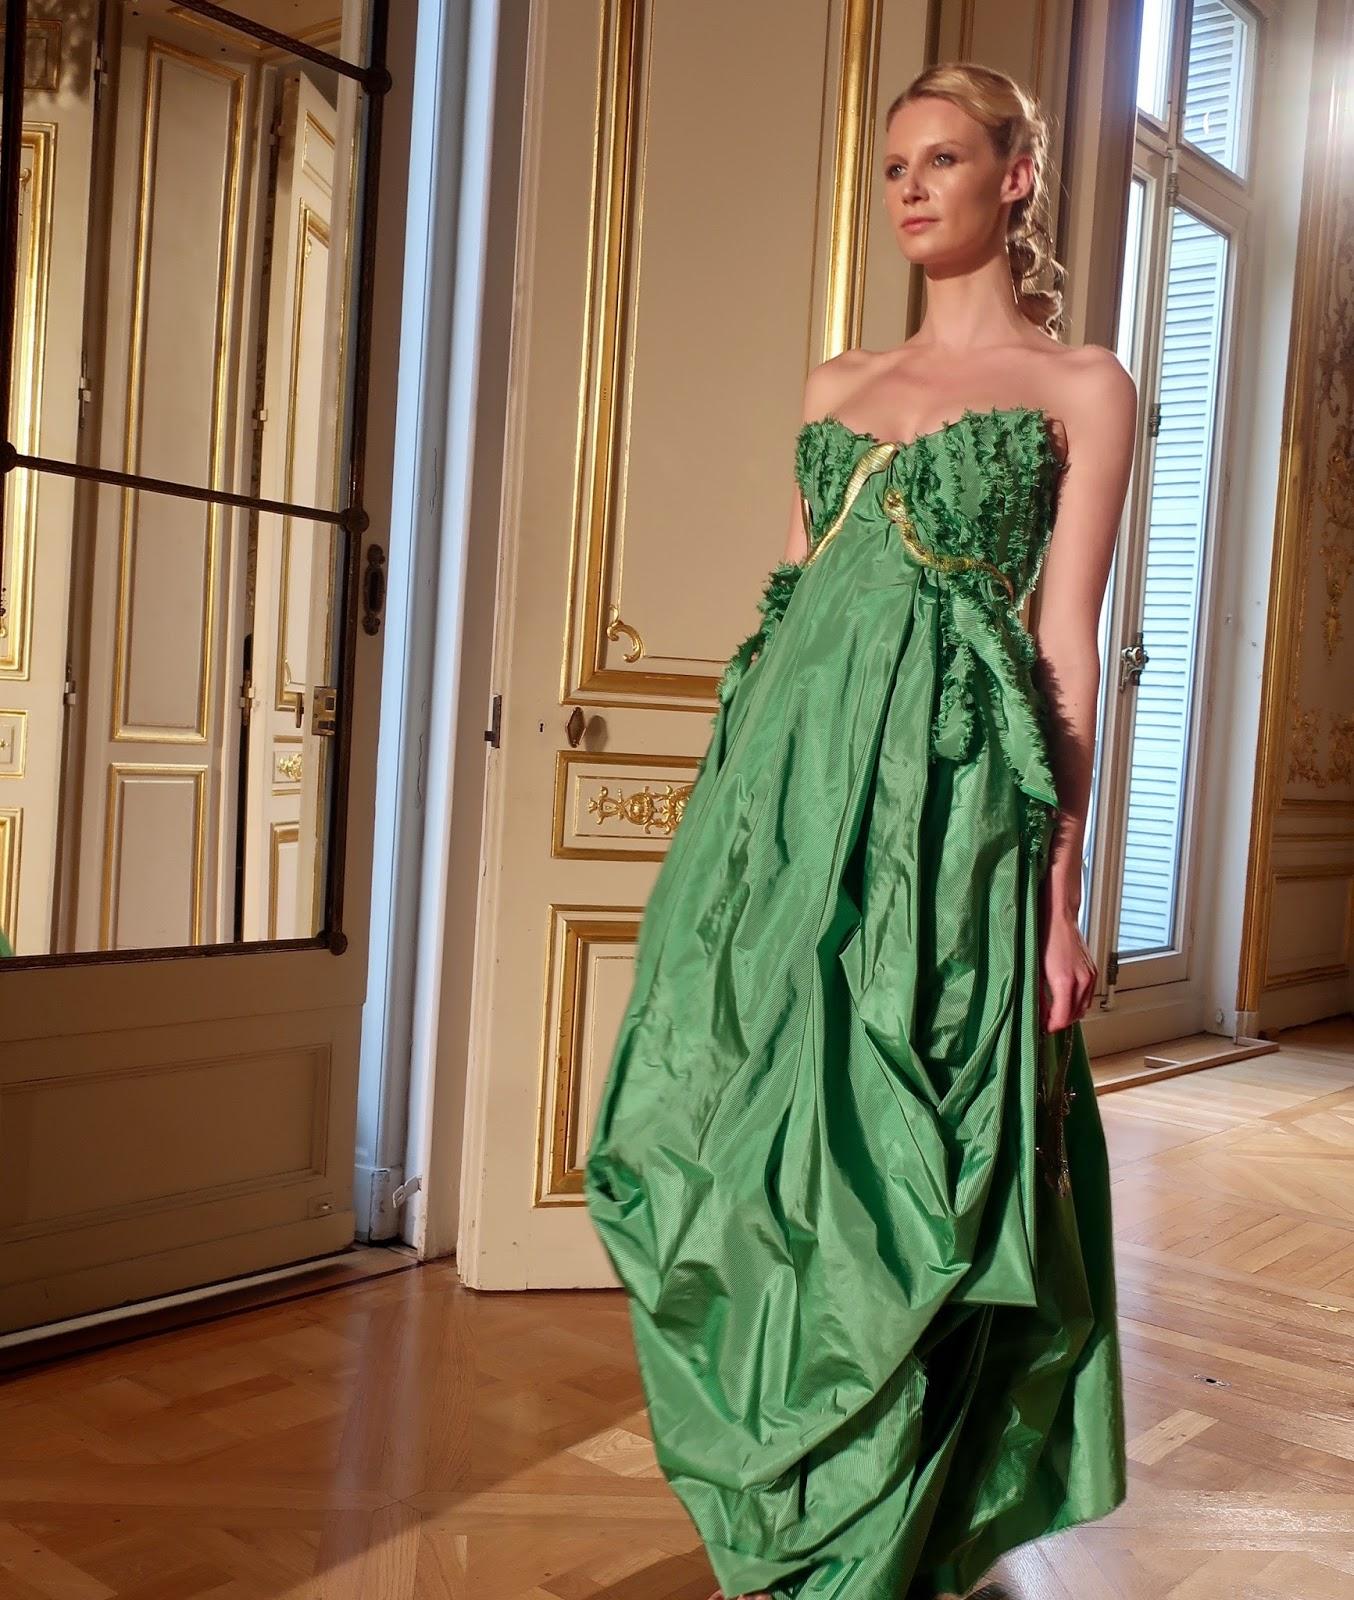 f42509a79b89a INTERNATIONAL LUXURY CONSULTING  LASKARIS Couture ...LASKARIS ...